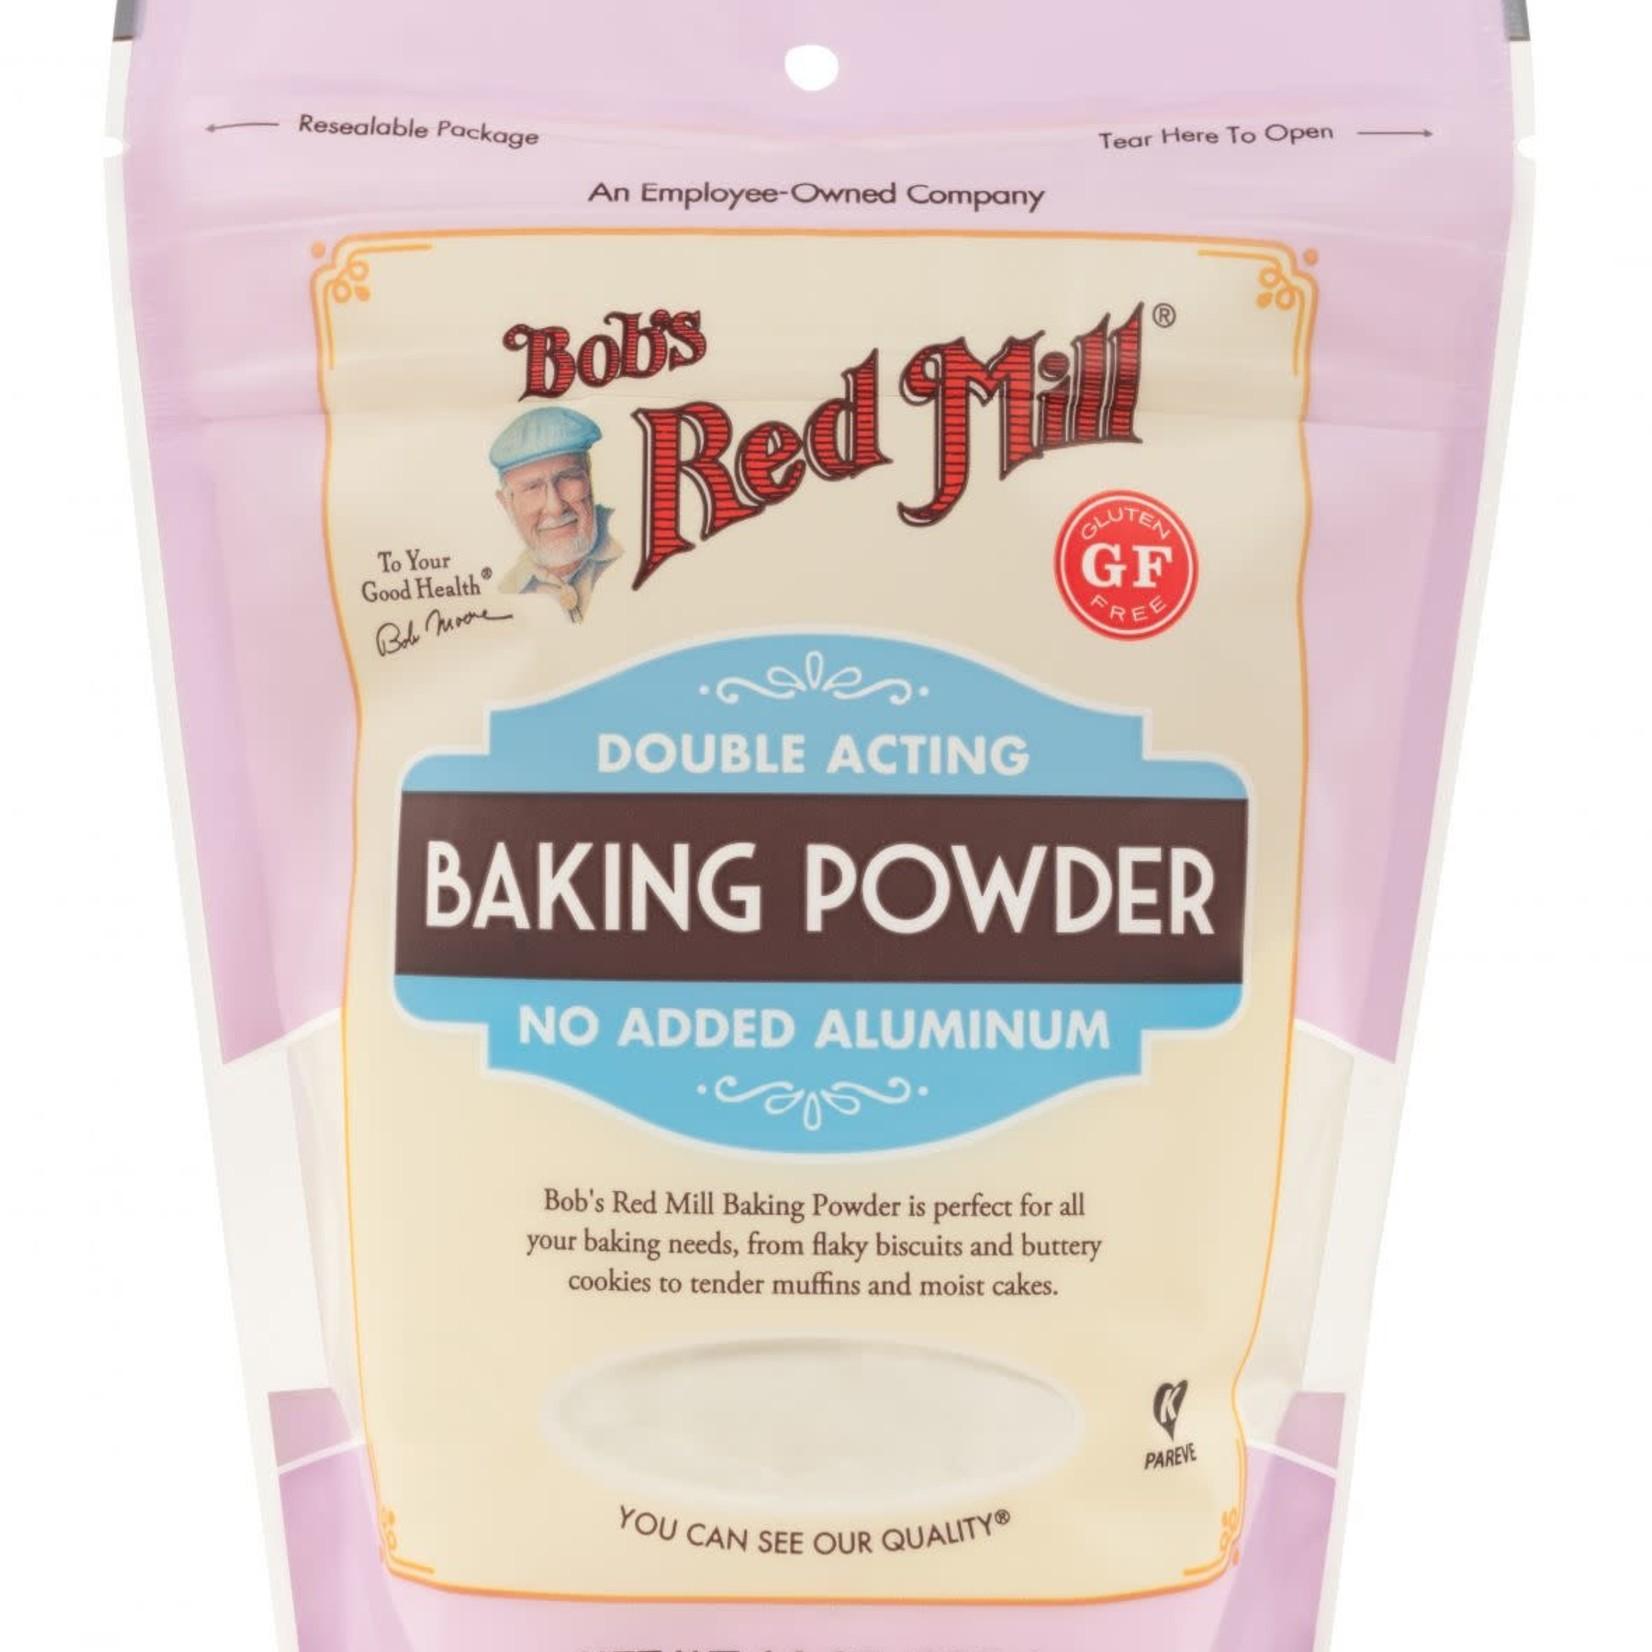 Bob's Red Mill Bob's Red Mill Baking Powder 397g